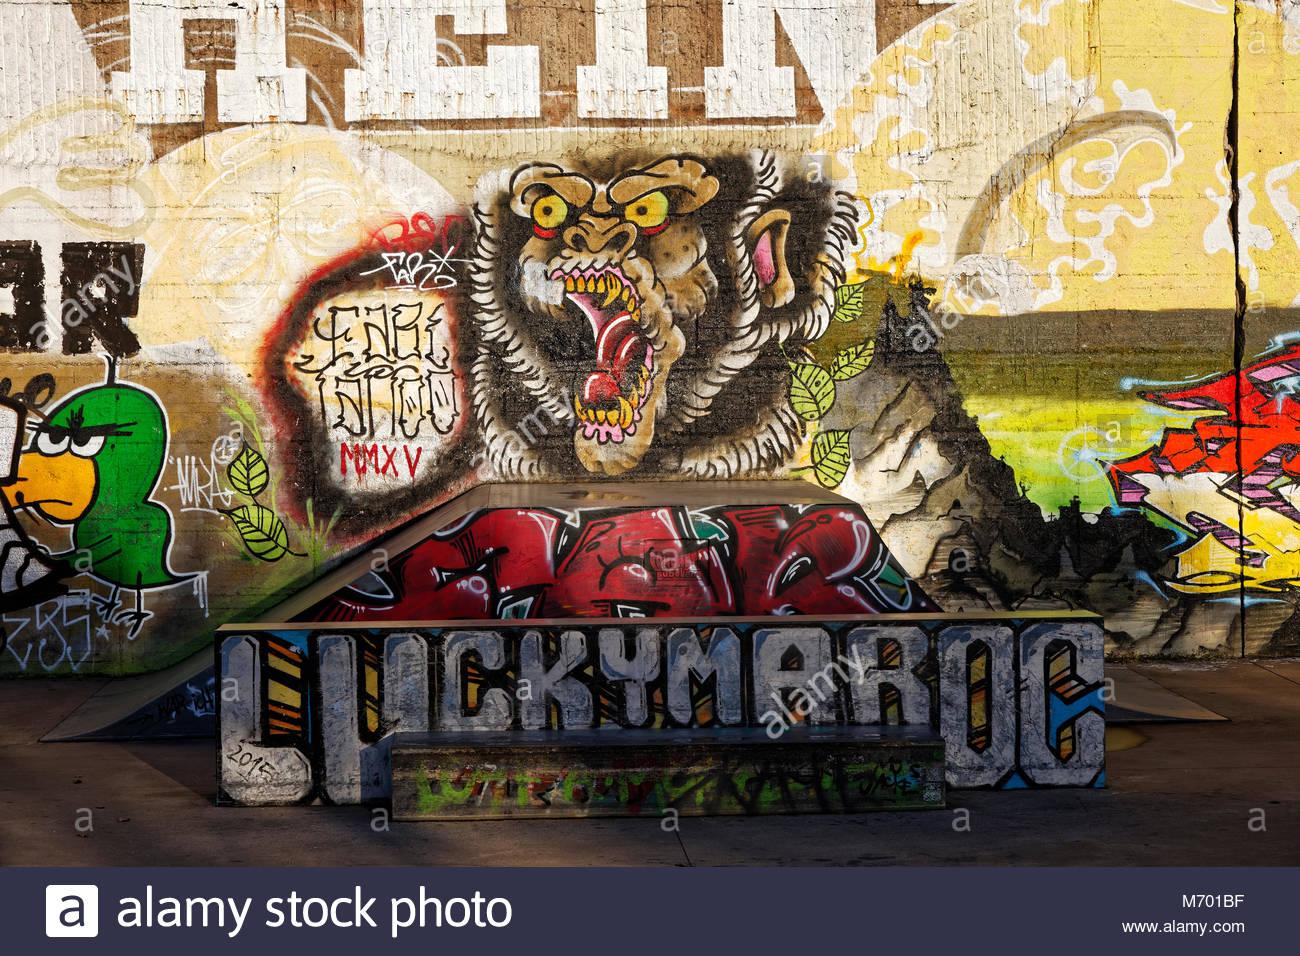 Graffiti Duisburg skatepark graffiti wall painting sport half pipe recreation